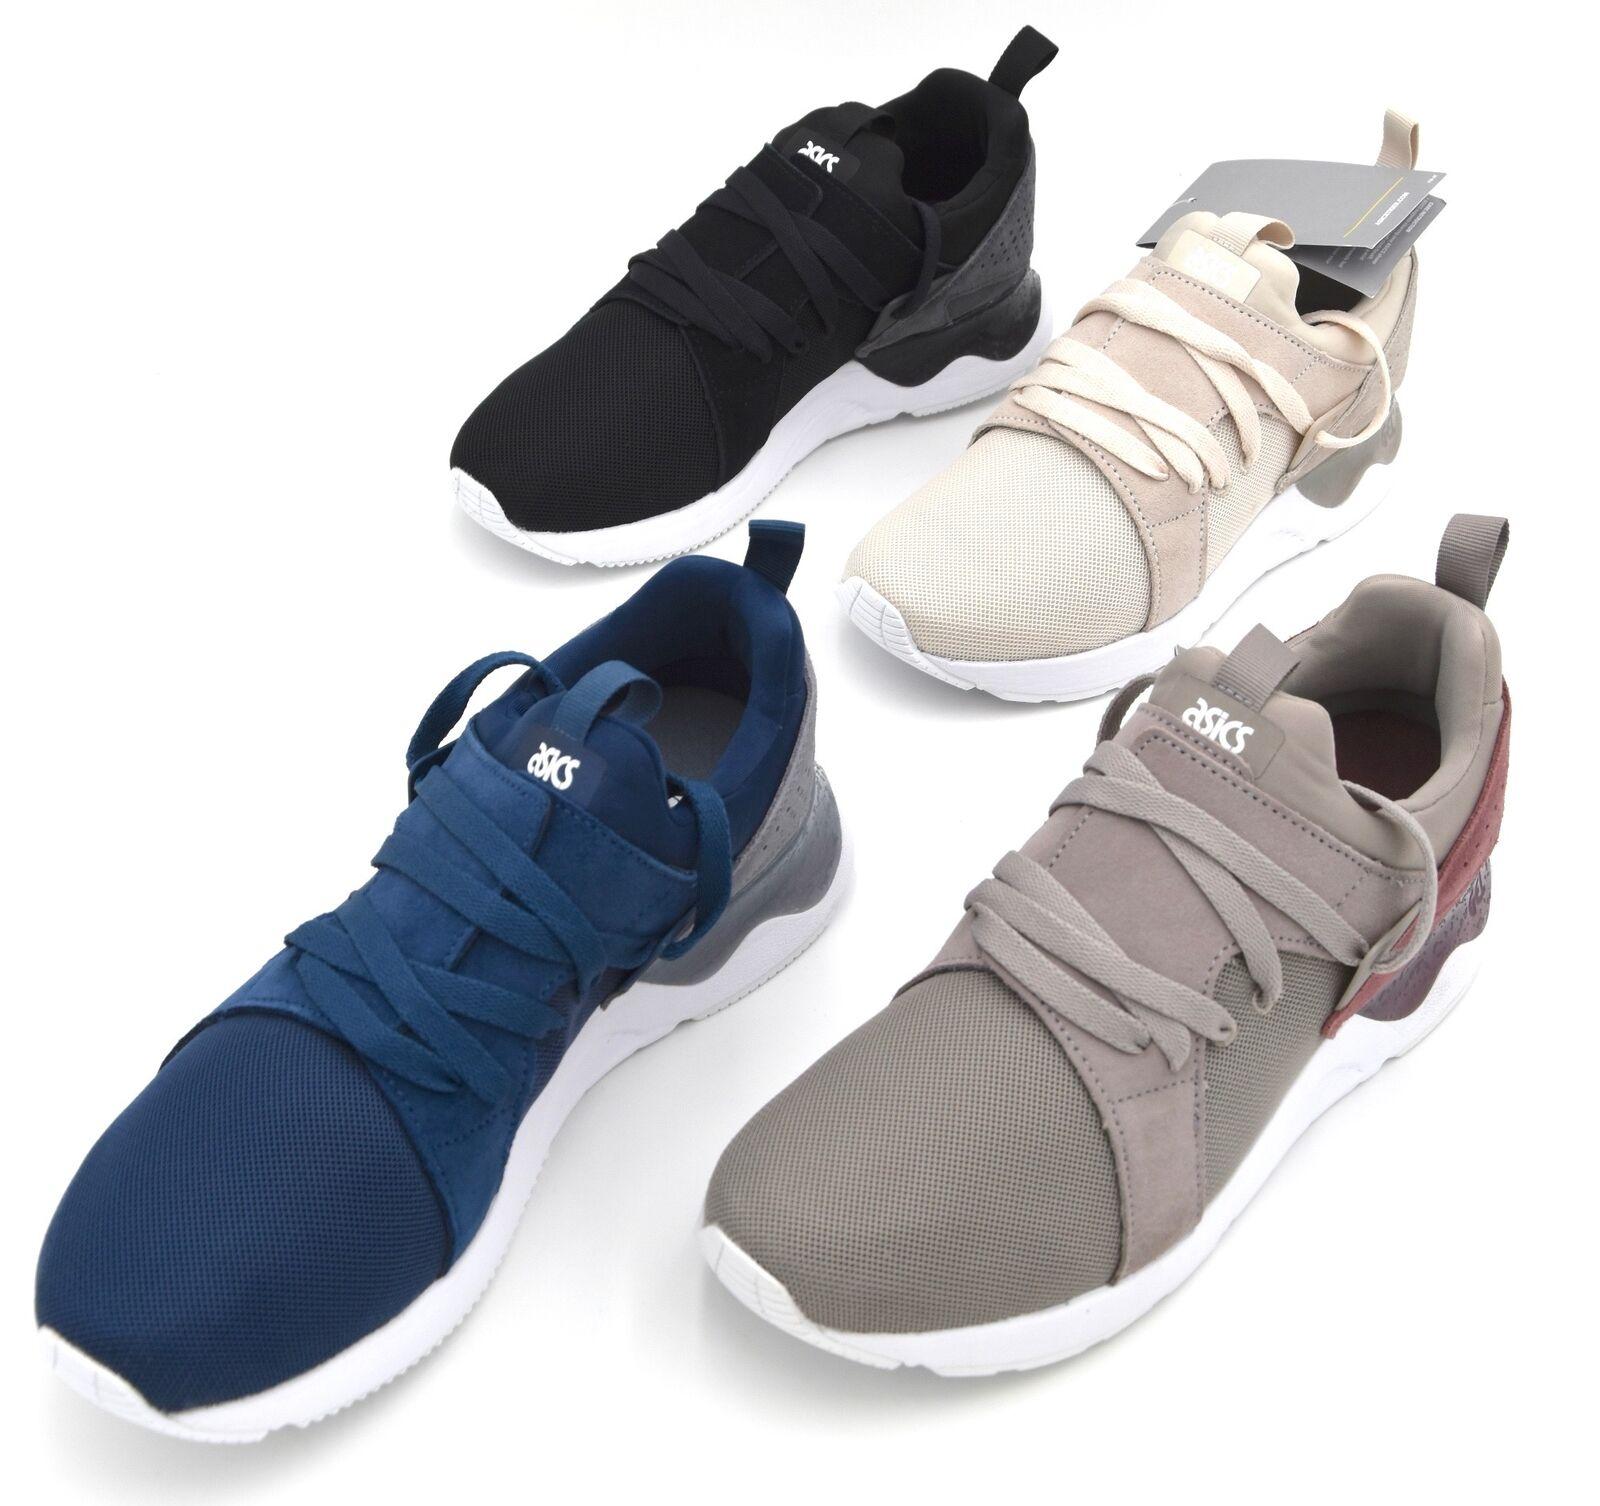 ASICS Hombre Mujer Mujer Mujer Unisex Zapatillas Zapatos informales Gratis TIME H817L GEL-LYTE V sanze  grandes ahorros